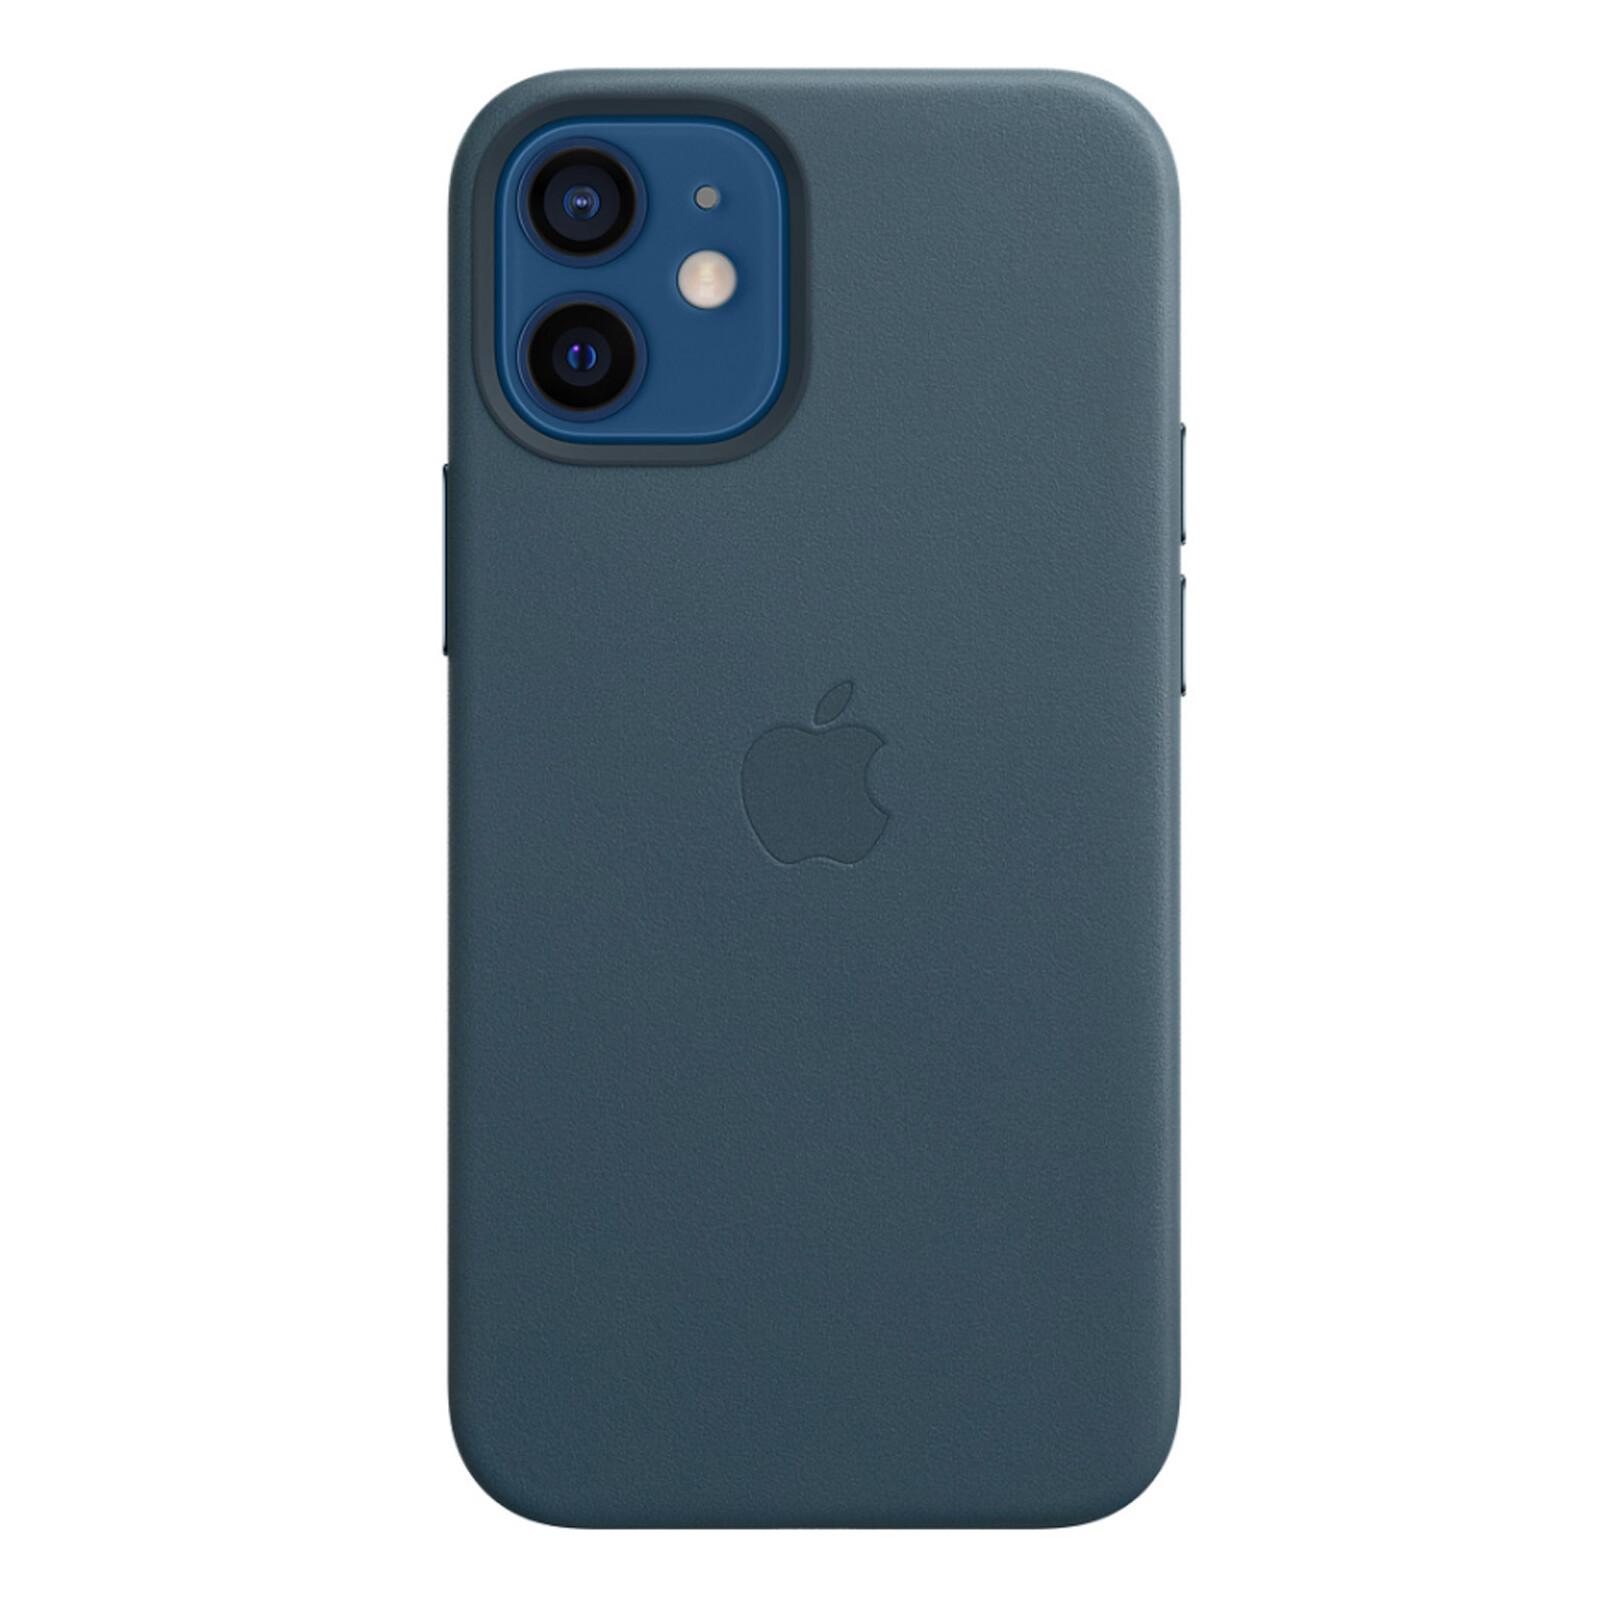 Apple iPhone 12 mini Leder Case mit MagSafe baltischblau